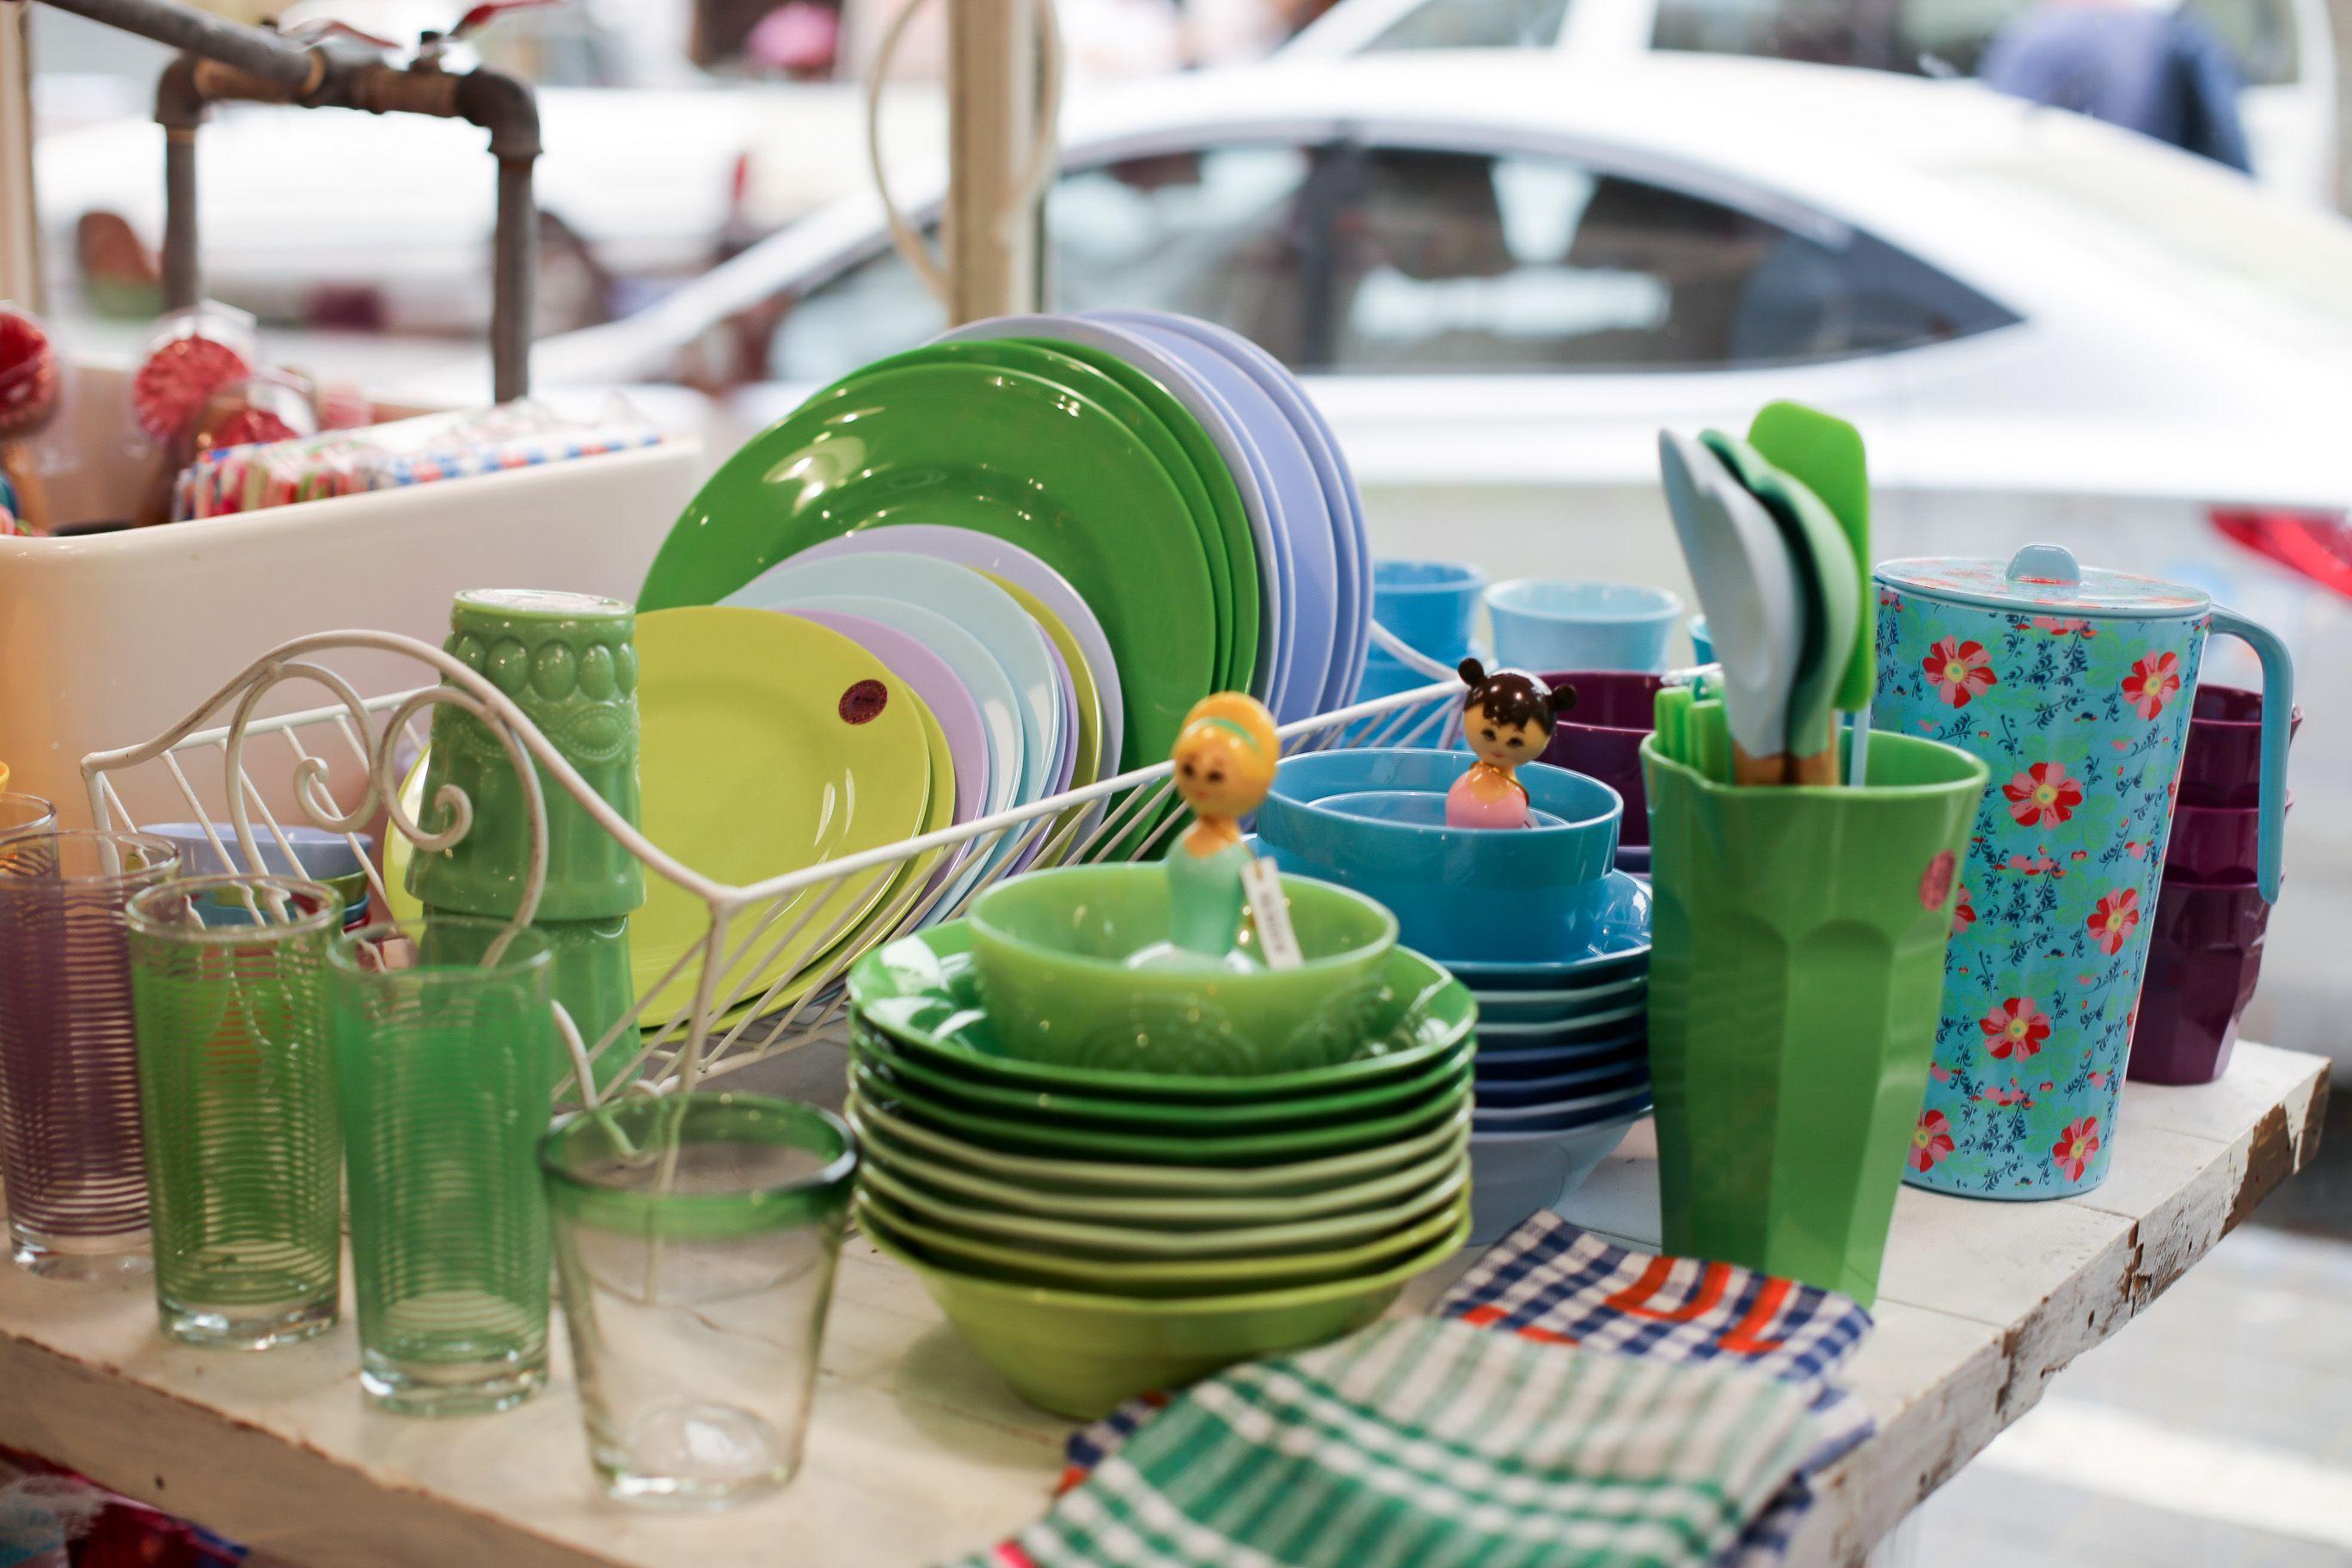 Kitchen design | Sofi, Nachman 3, Flea market, Jaffa @rice_up  photo by Naama Noach  #kitchen #interior_design #melamine #green #kitche_design